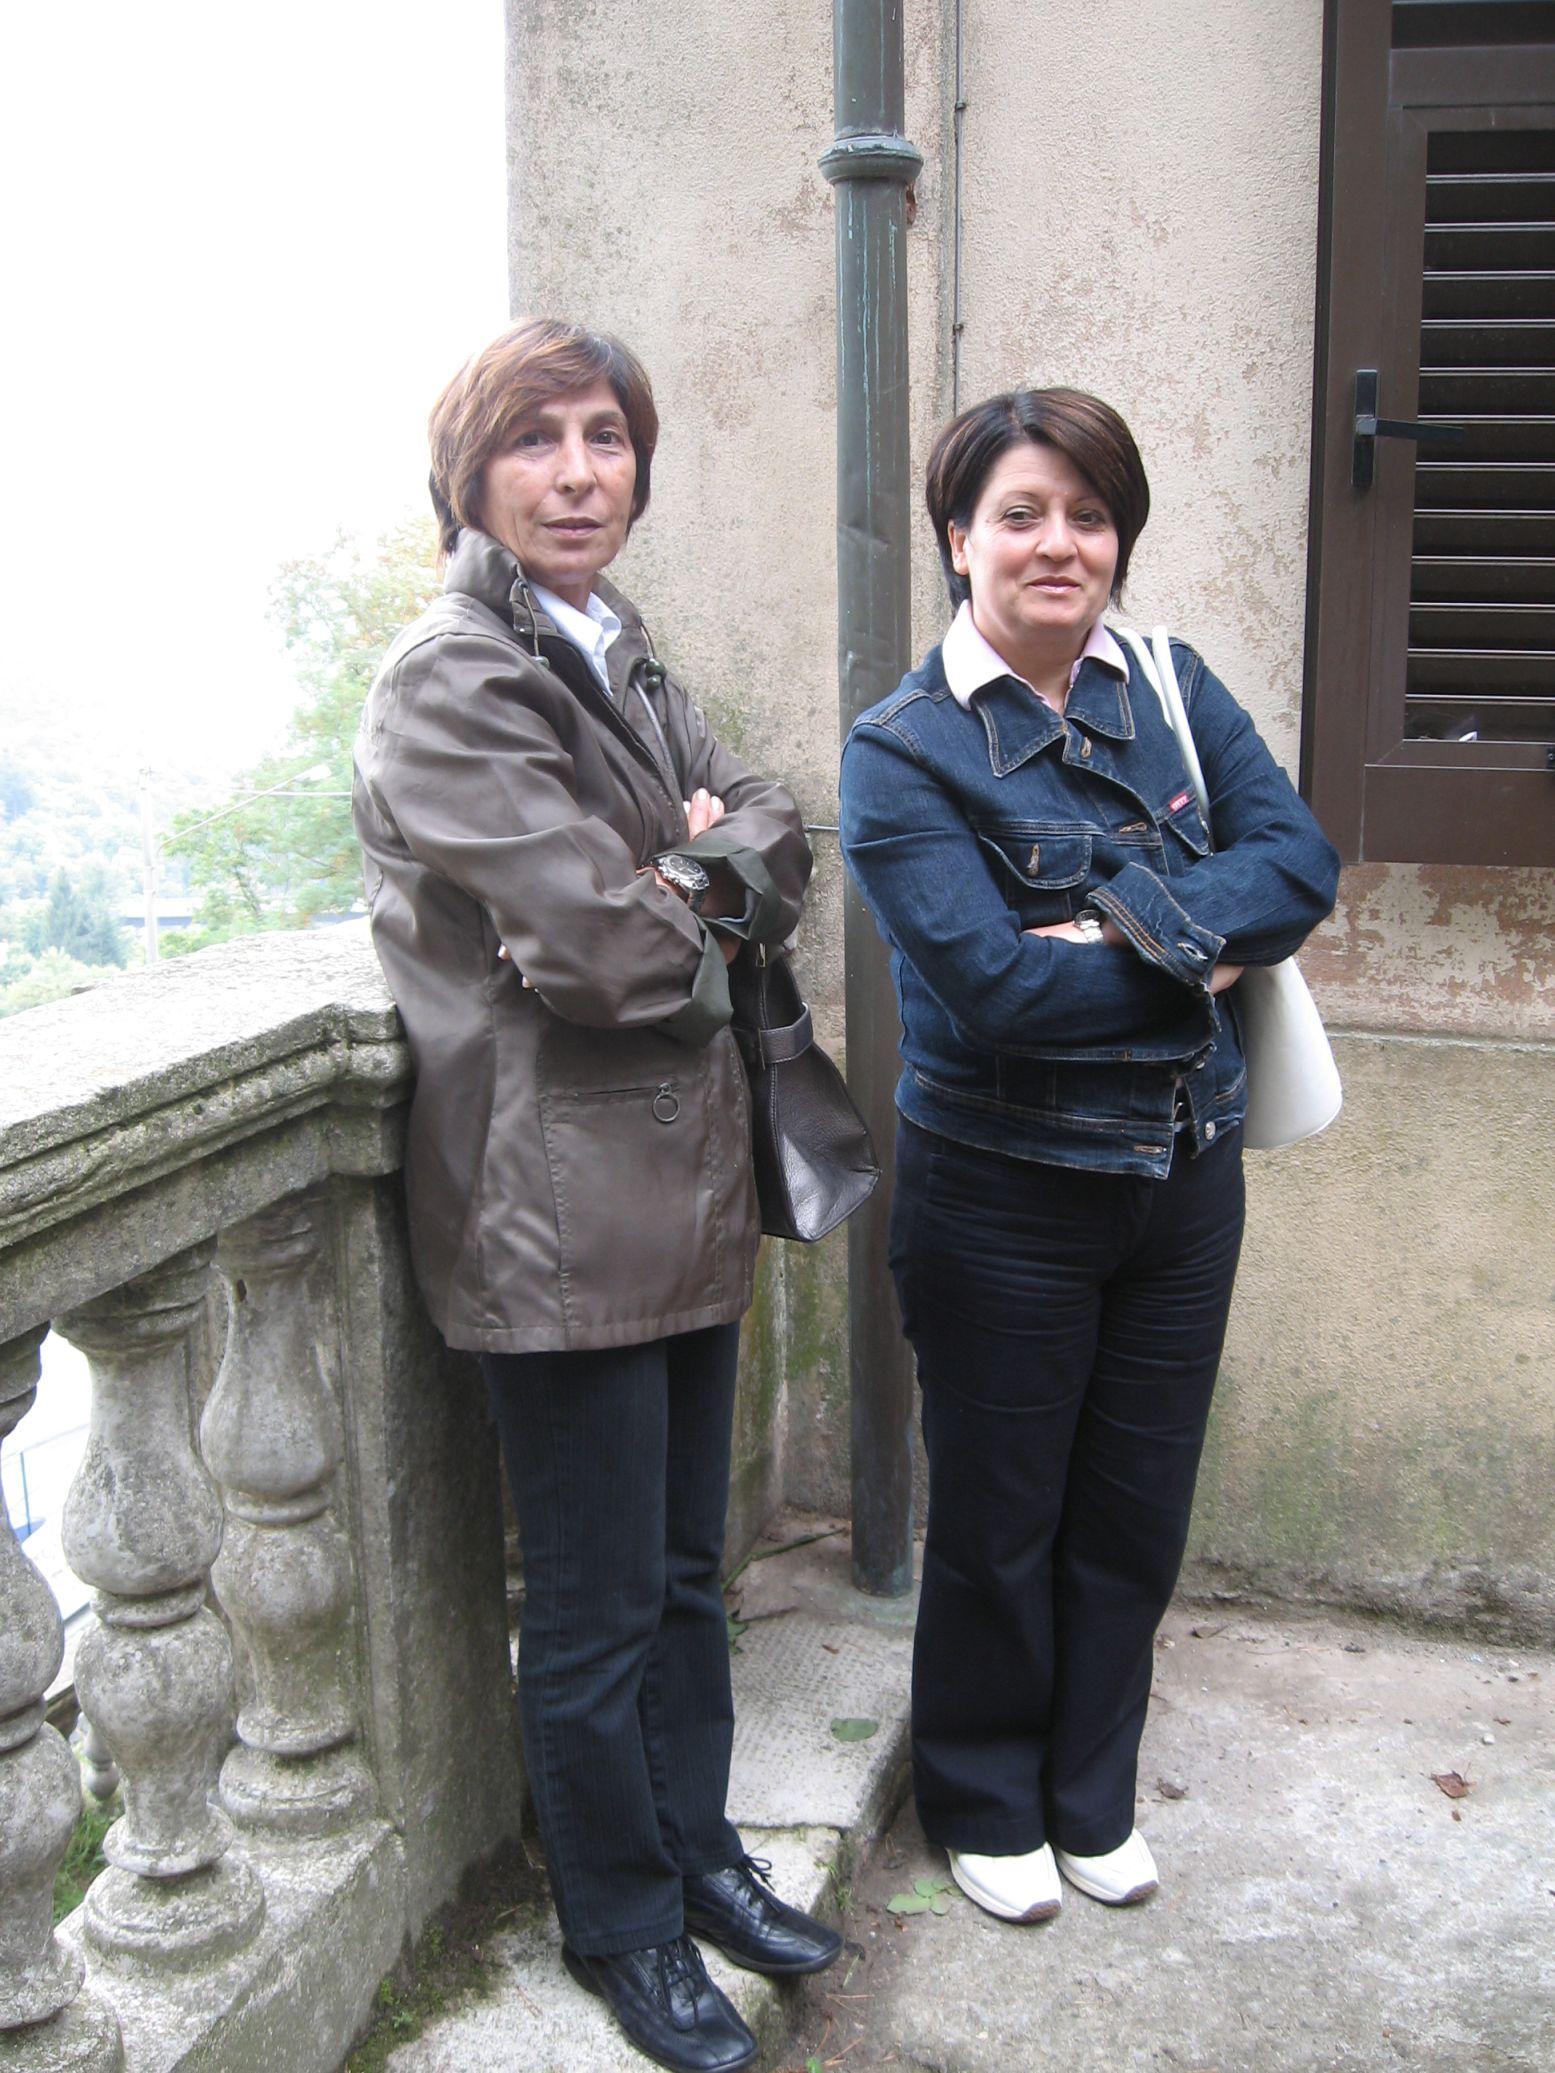 Bivacco_Persone_Impegnate_Torriglia-2009-09-20--15.10.01